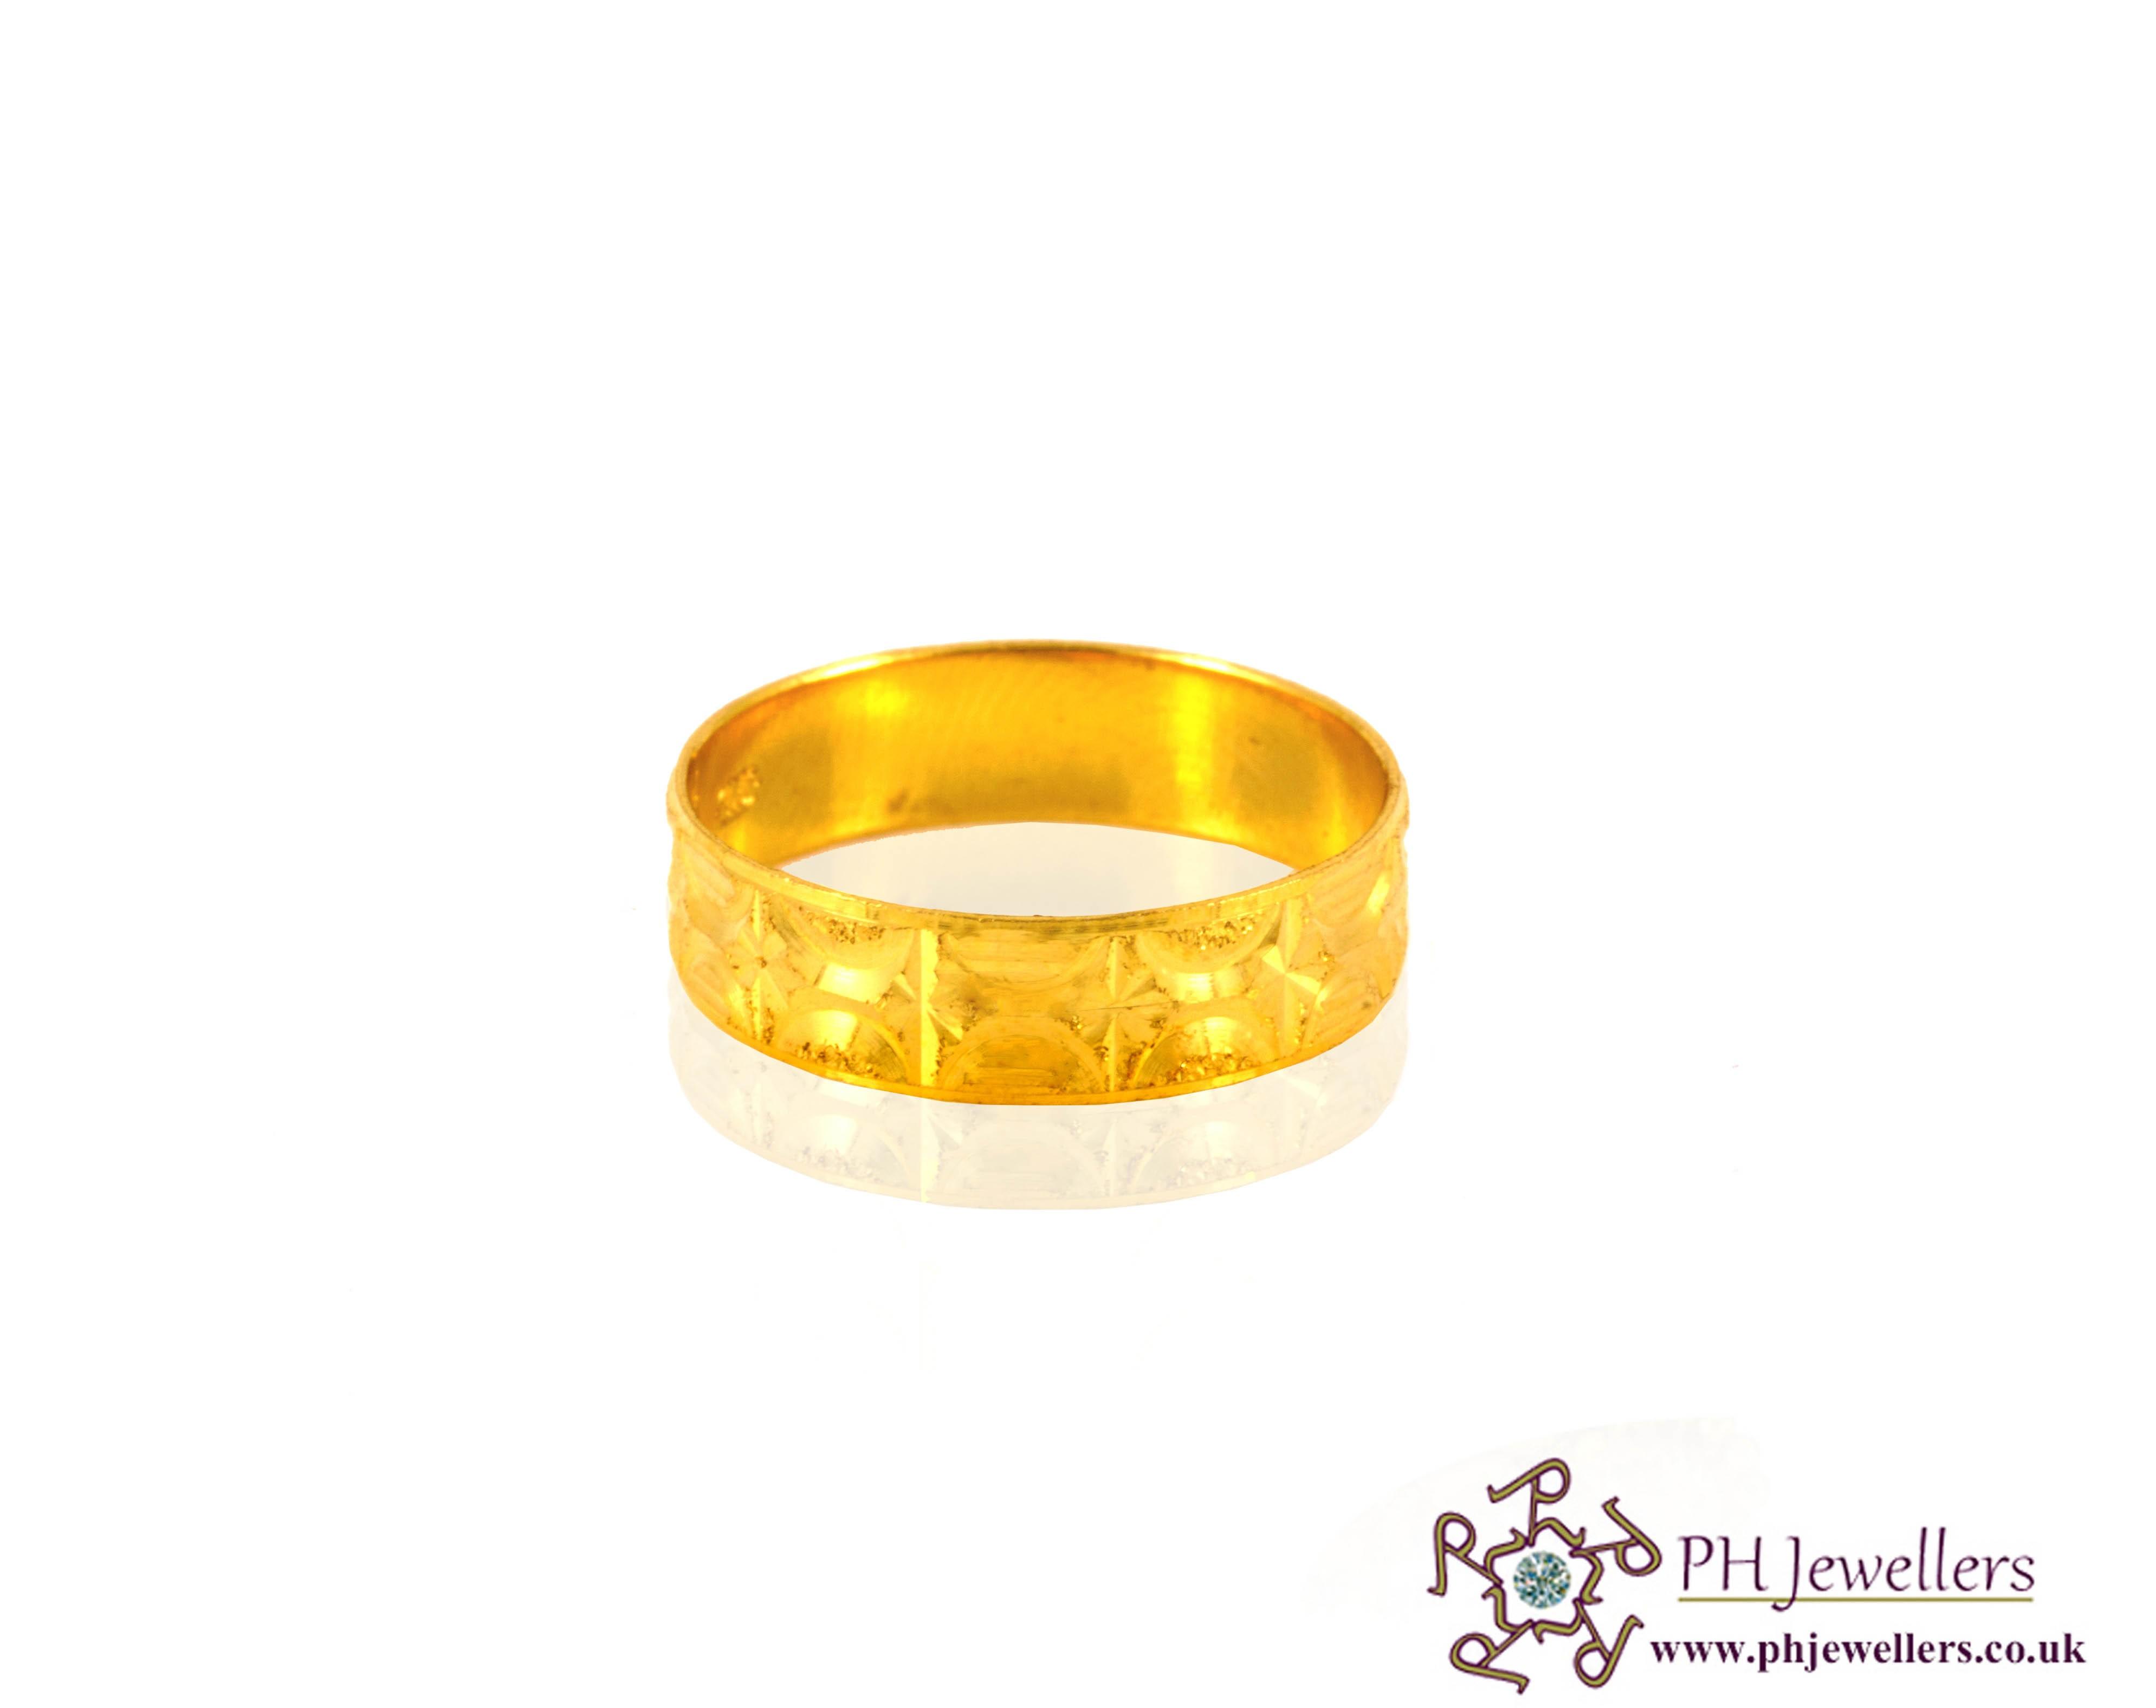 Online Gold Jewellery Gold Jewellery Ring 22ct 916 Hallmark Yellow